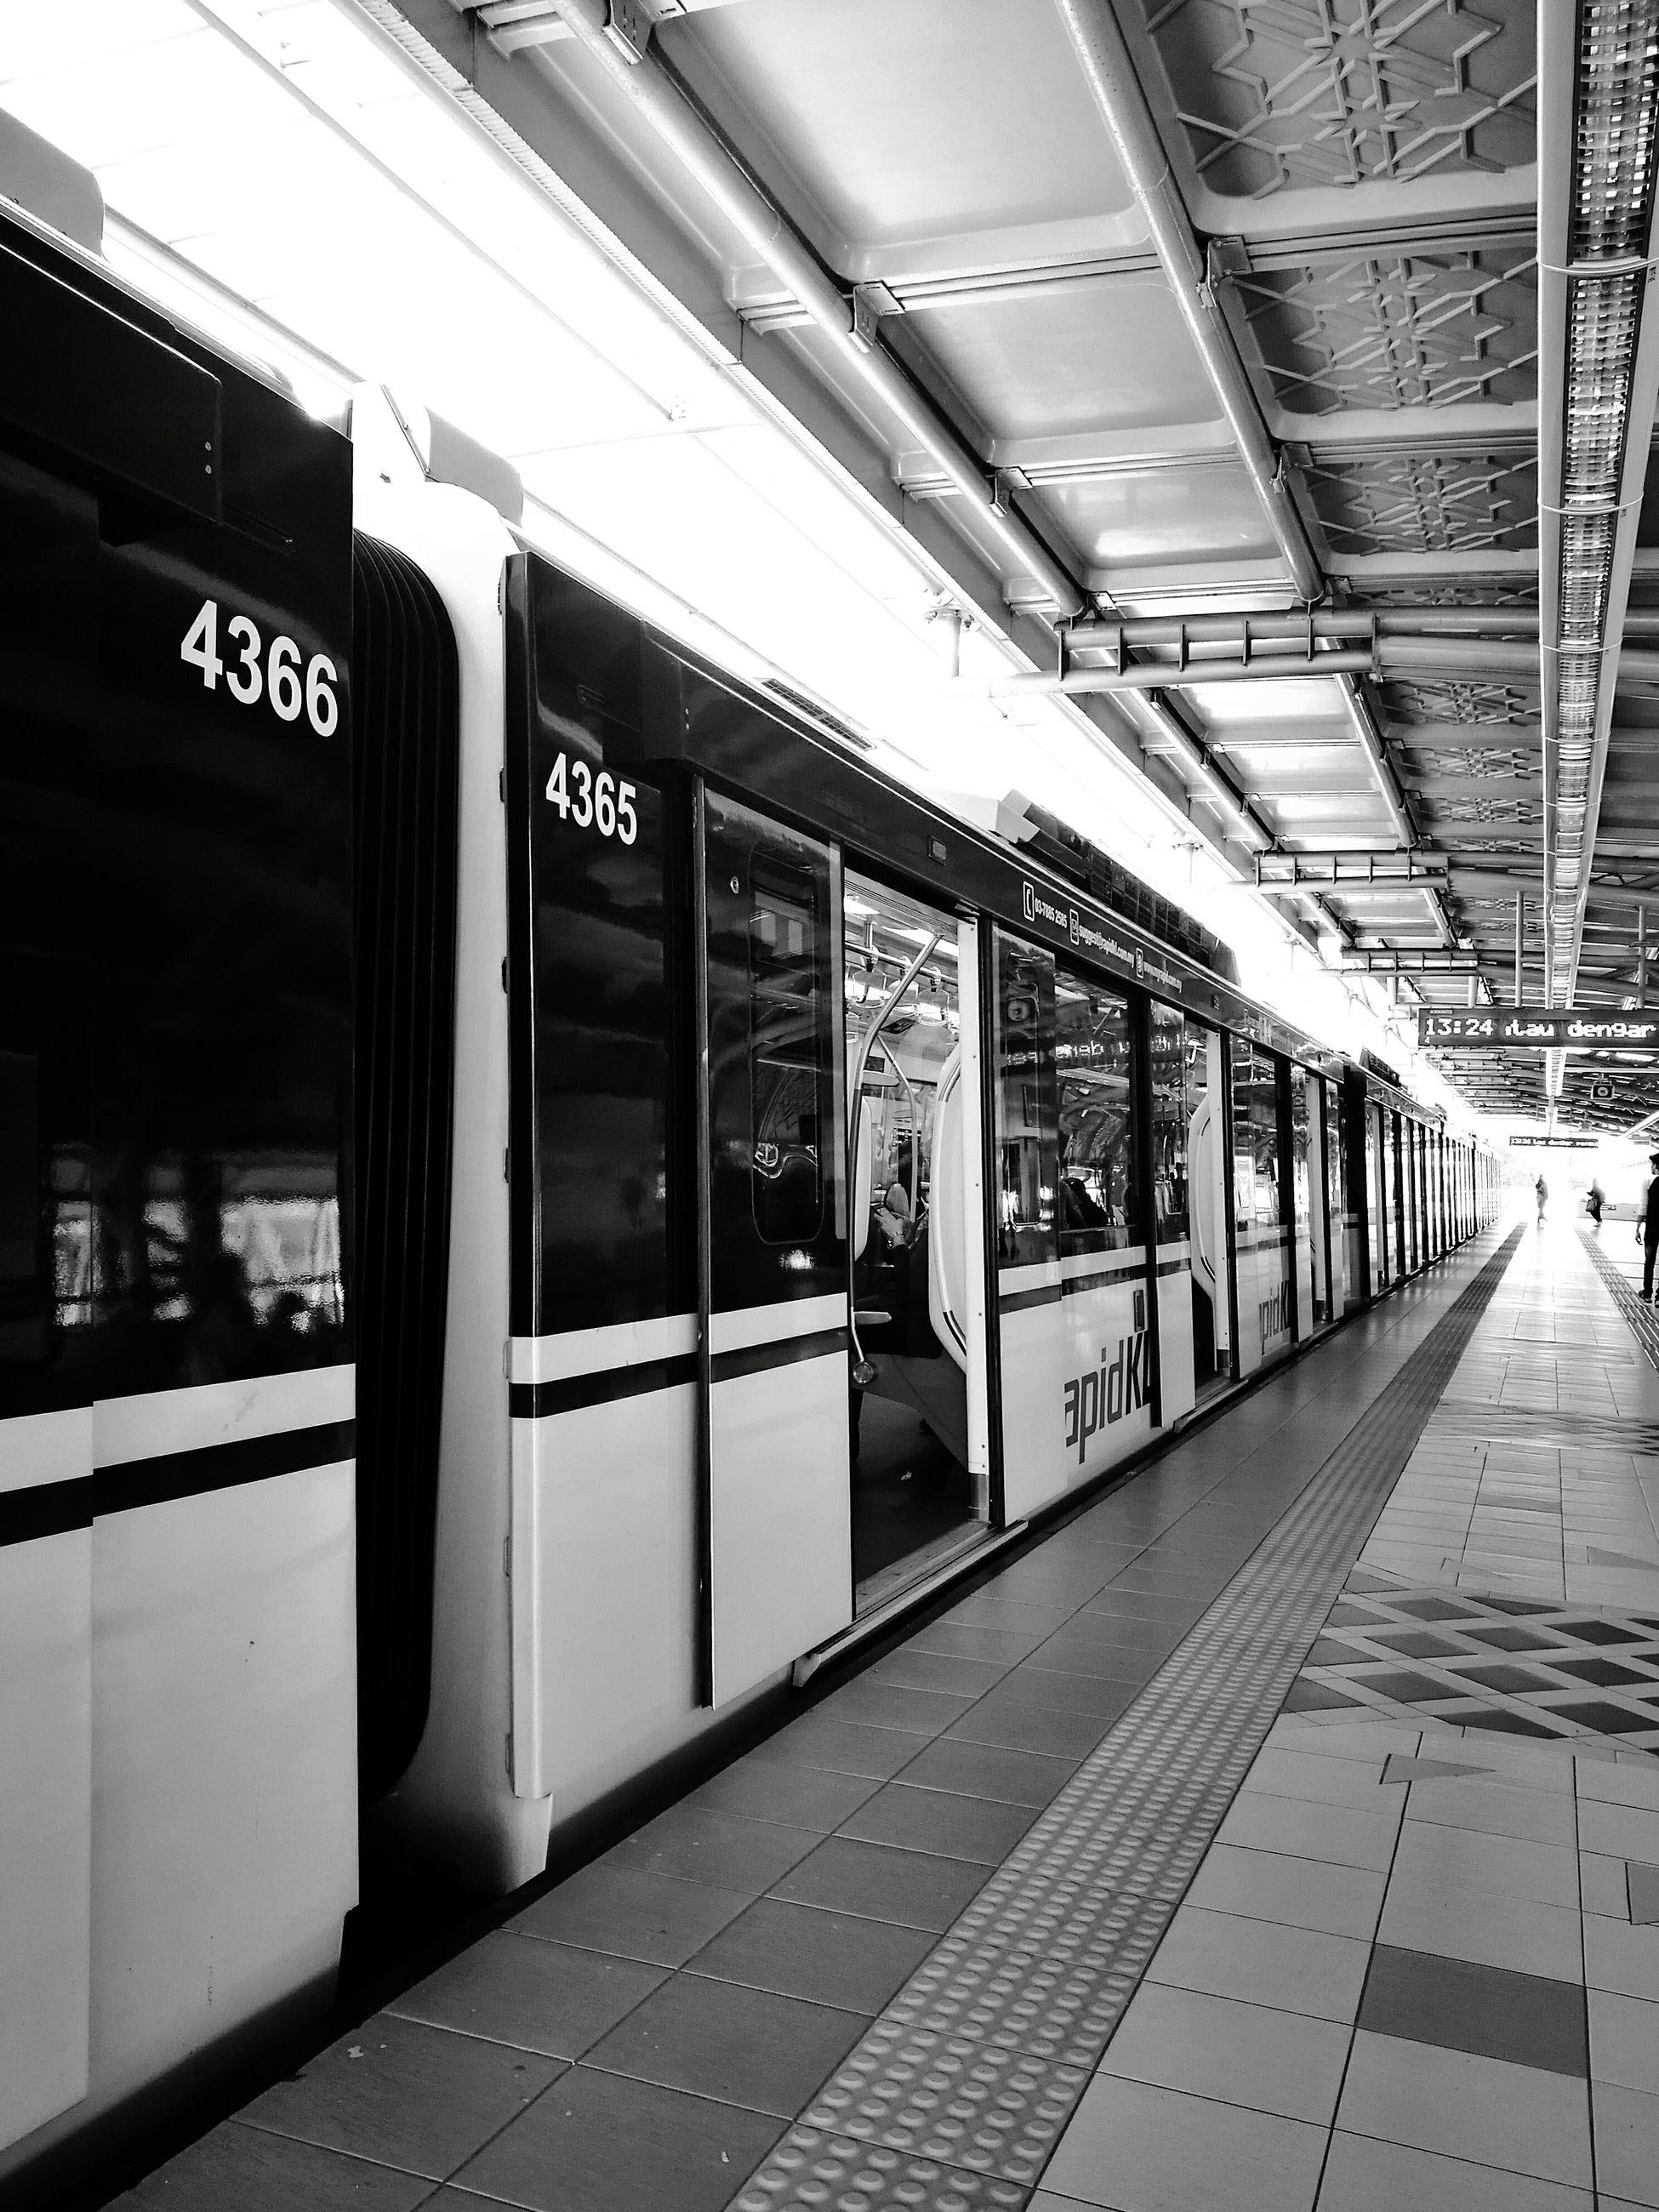 transportation, indoors, train - vehicle, travel, public transportation, subway train, no people, day, clock